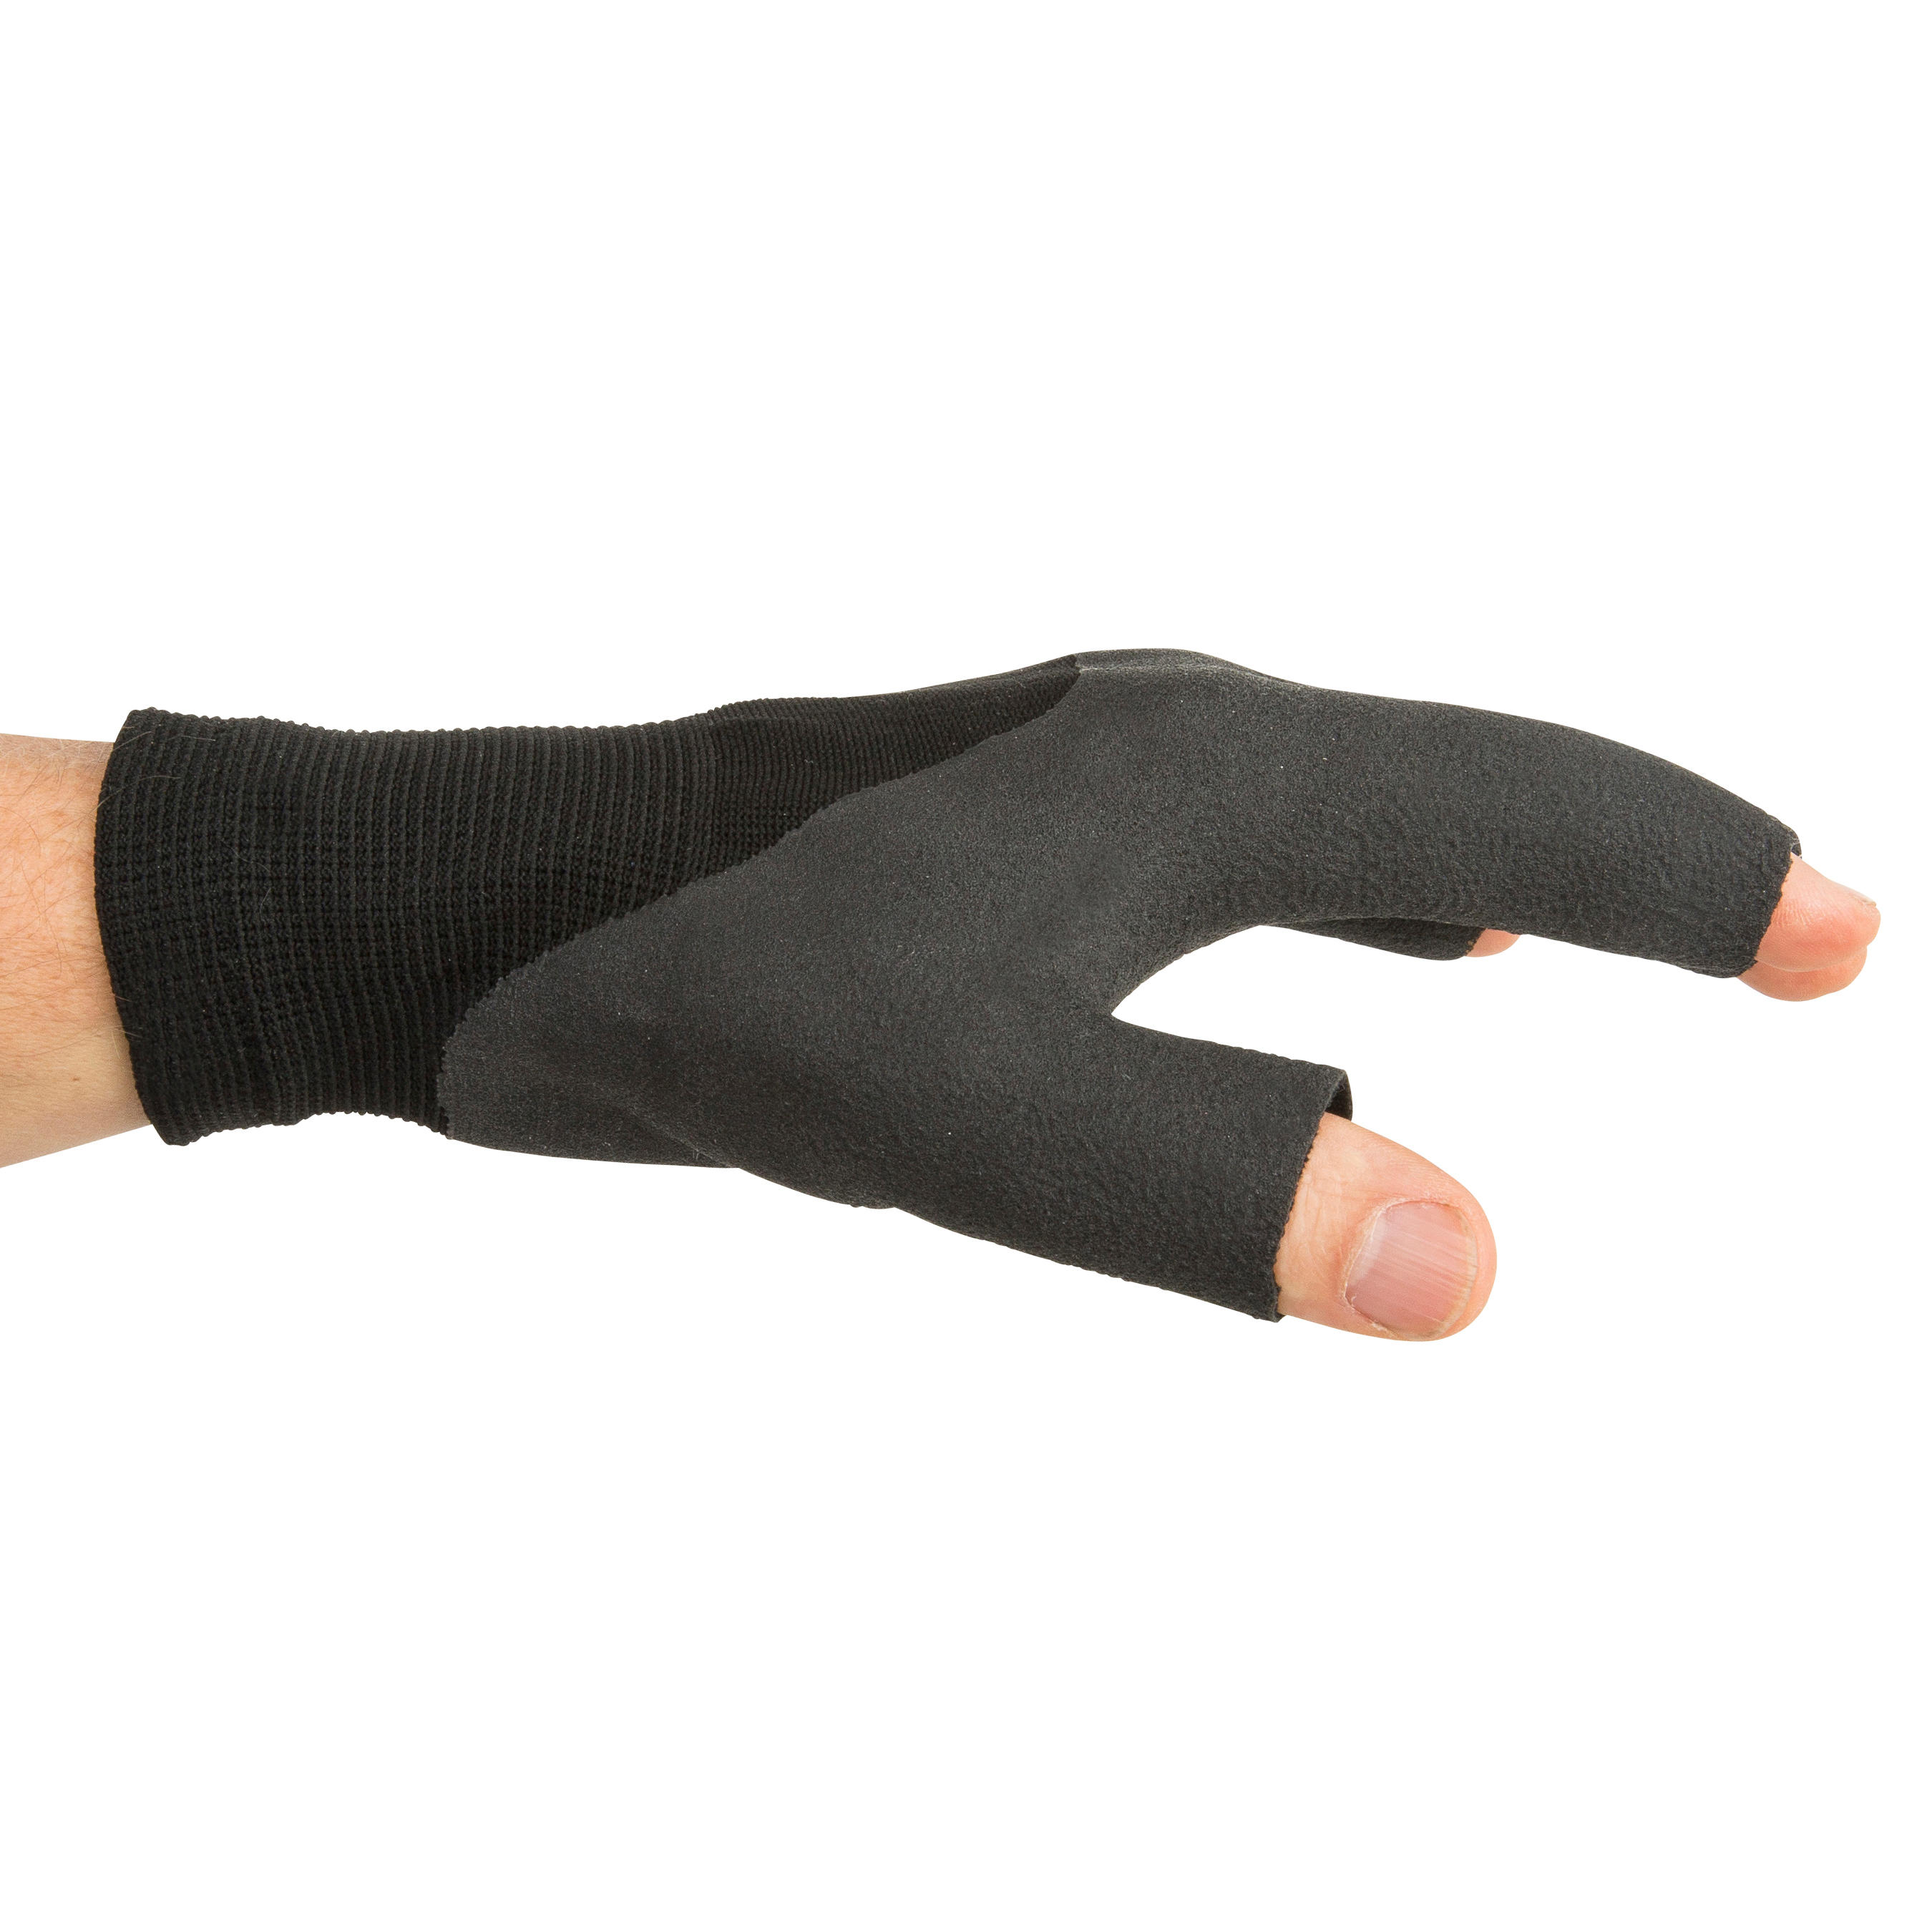 Sailing 100 Adult Sailing Fingerless Gloves - Black